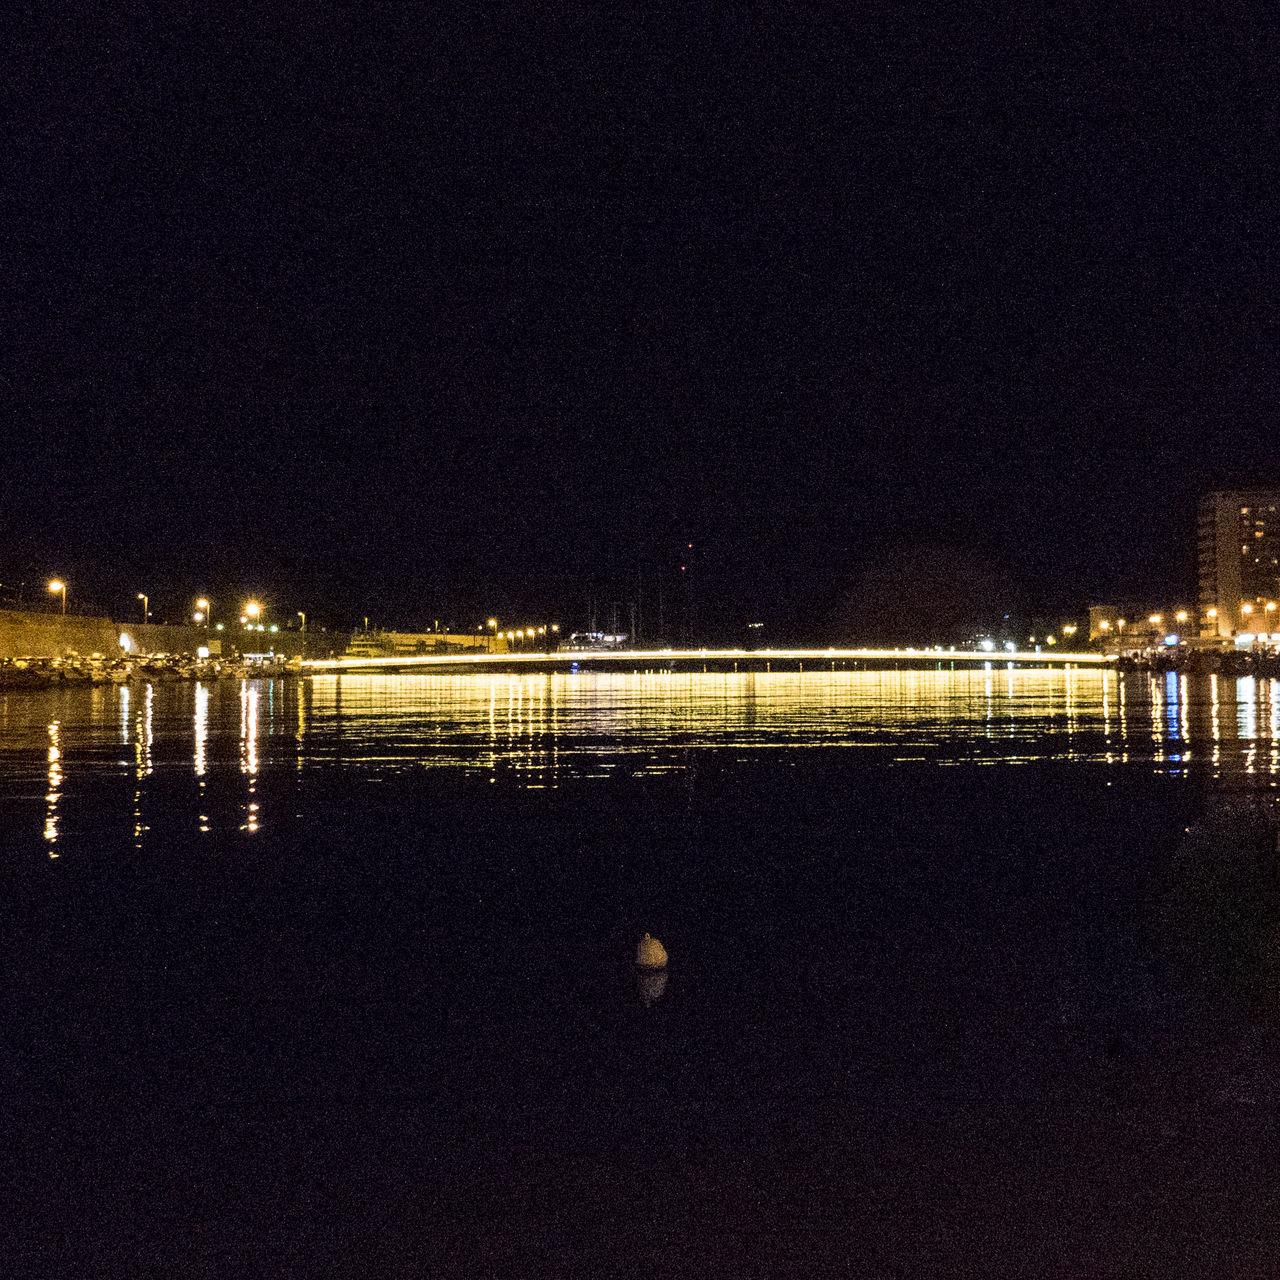 REFLECTION OF ILLUMINATED CALM SEA IN THE DARK